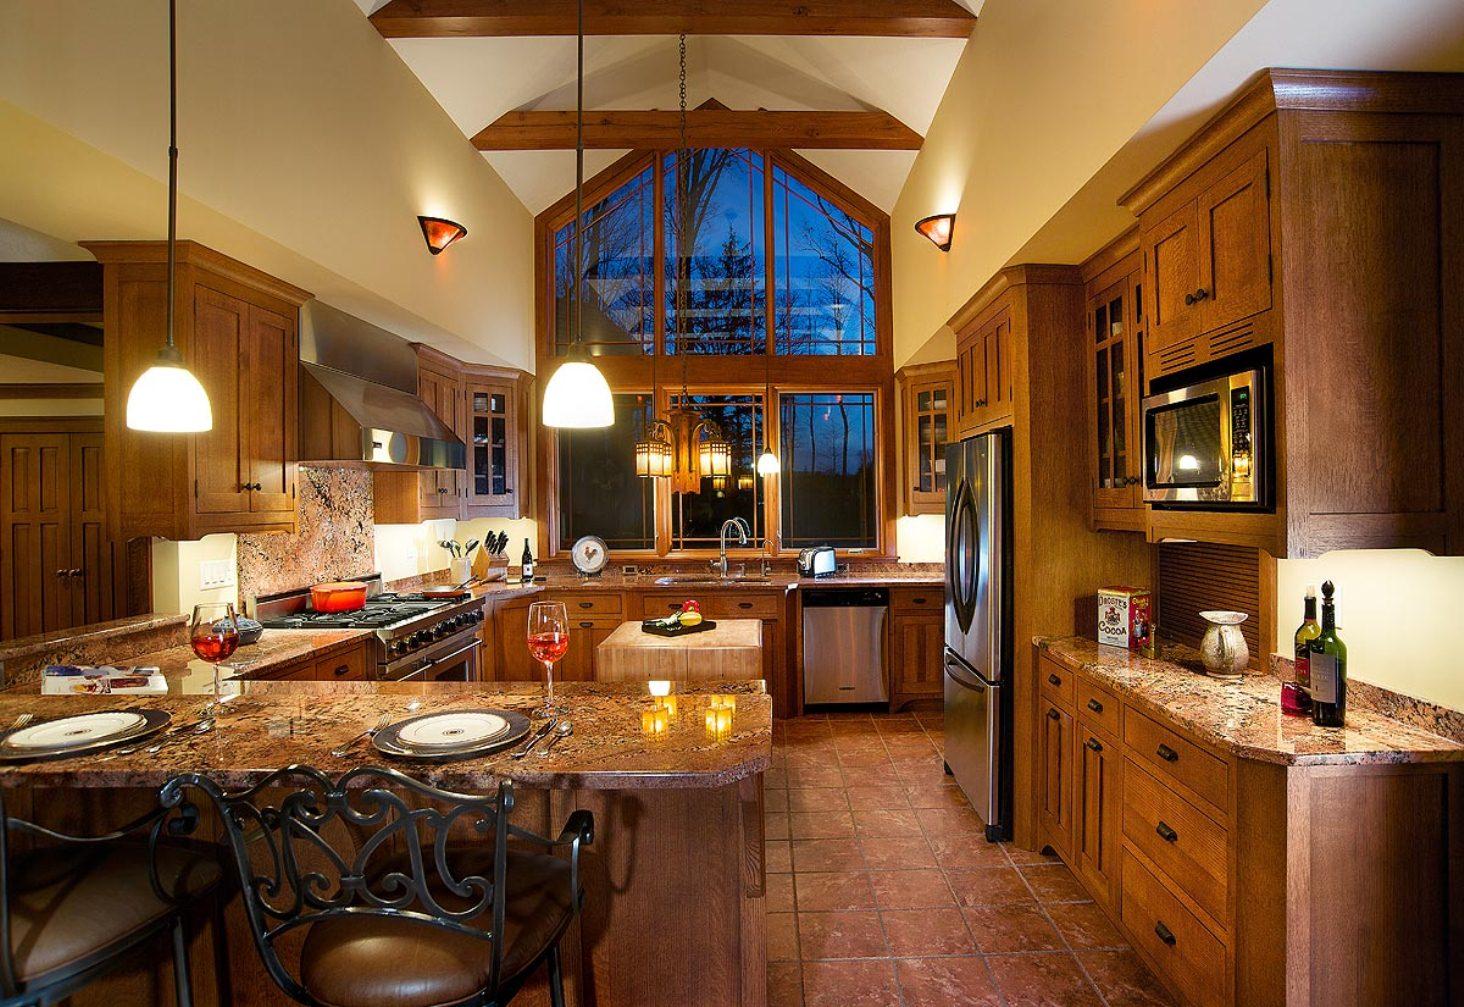 appealing-brown-cherry-wood-amish-kitchen-cabinets-double-door-cabinets-black-color-metal-knobs-black-color-metal-handles-wall-mounted-cabinet-with-glass-lite-door-brown-wooden-crown-molding-cabinets.jpg